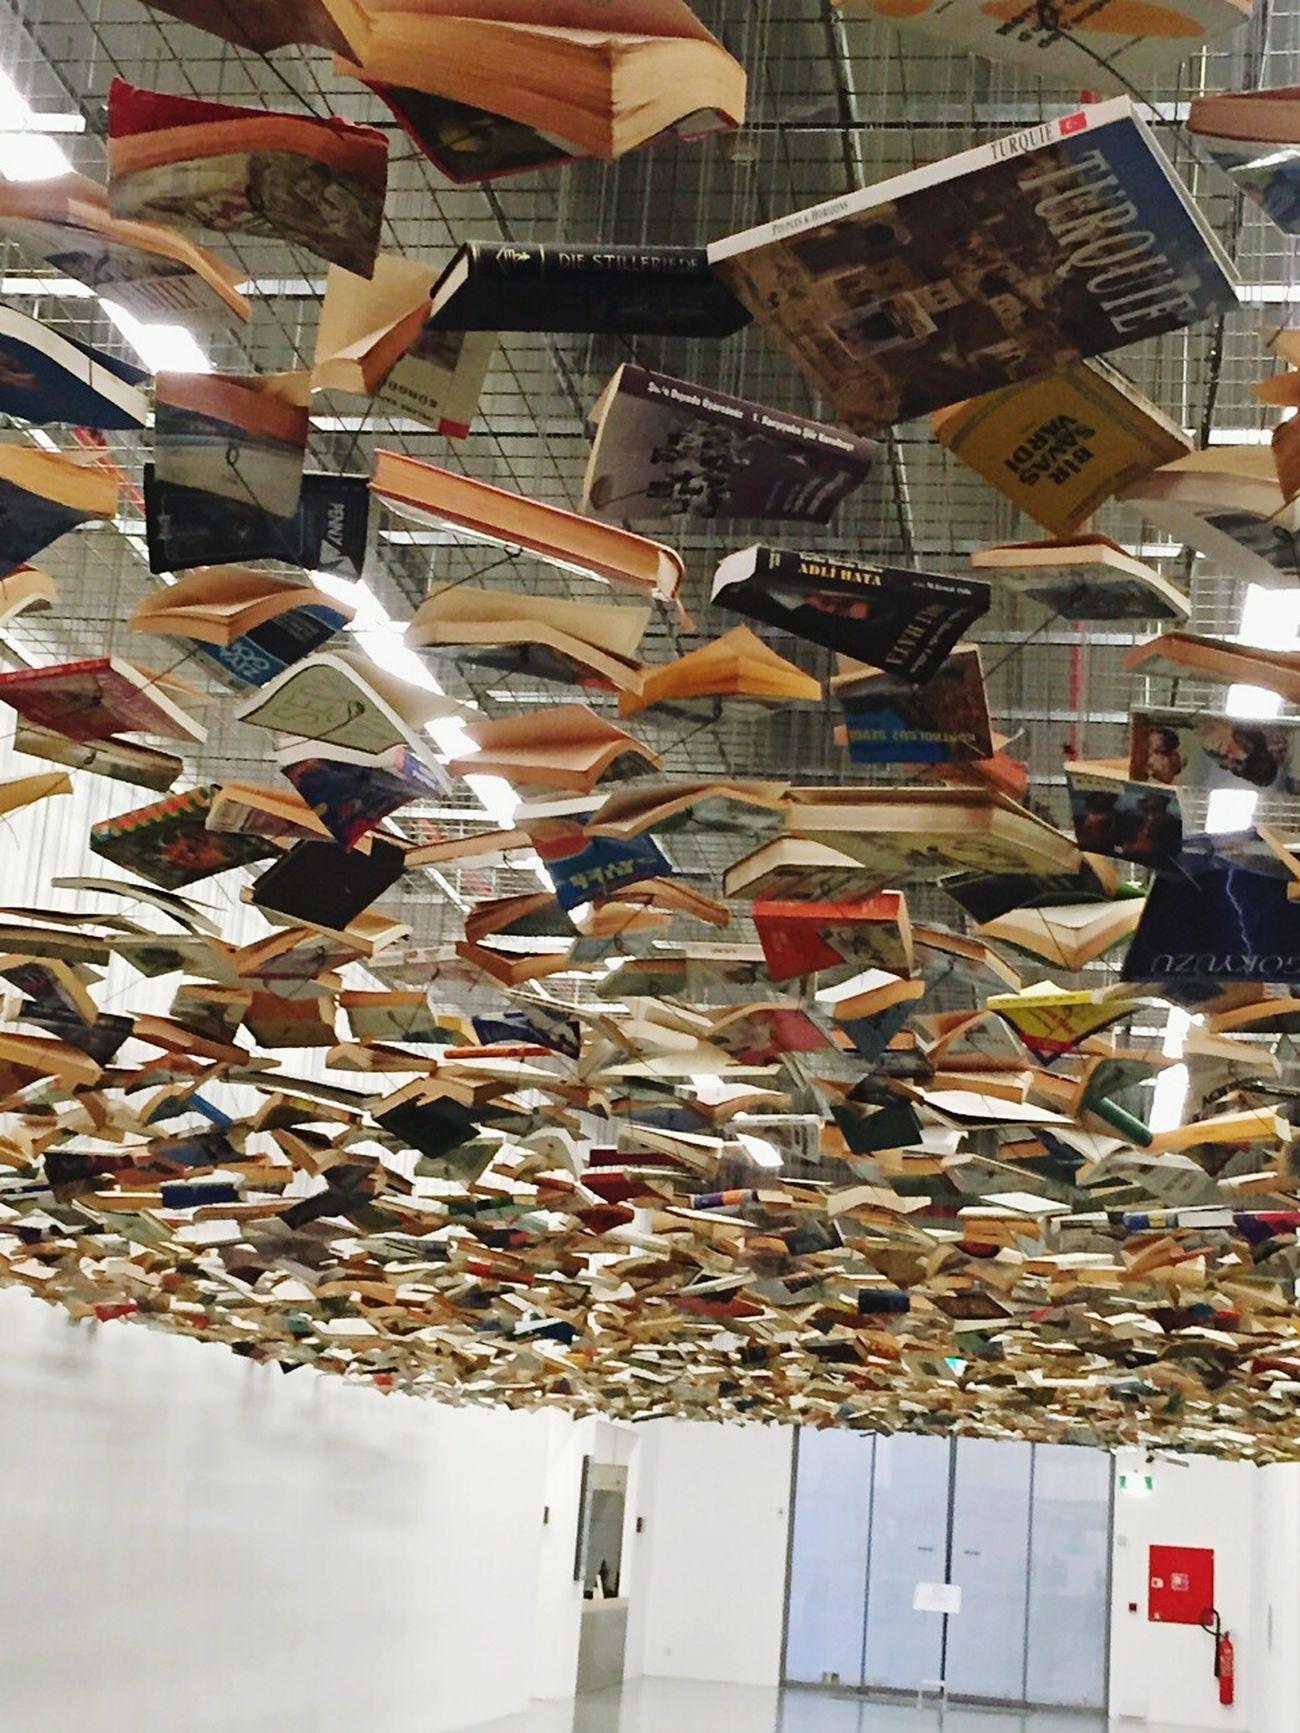 Istanbulmodern Turkey Awseome Books ♥